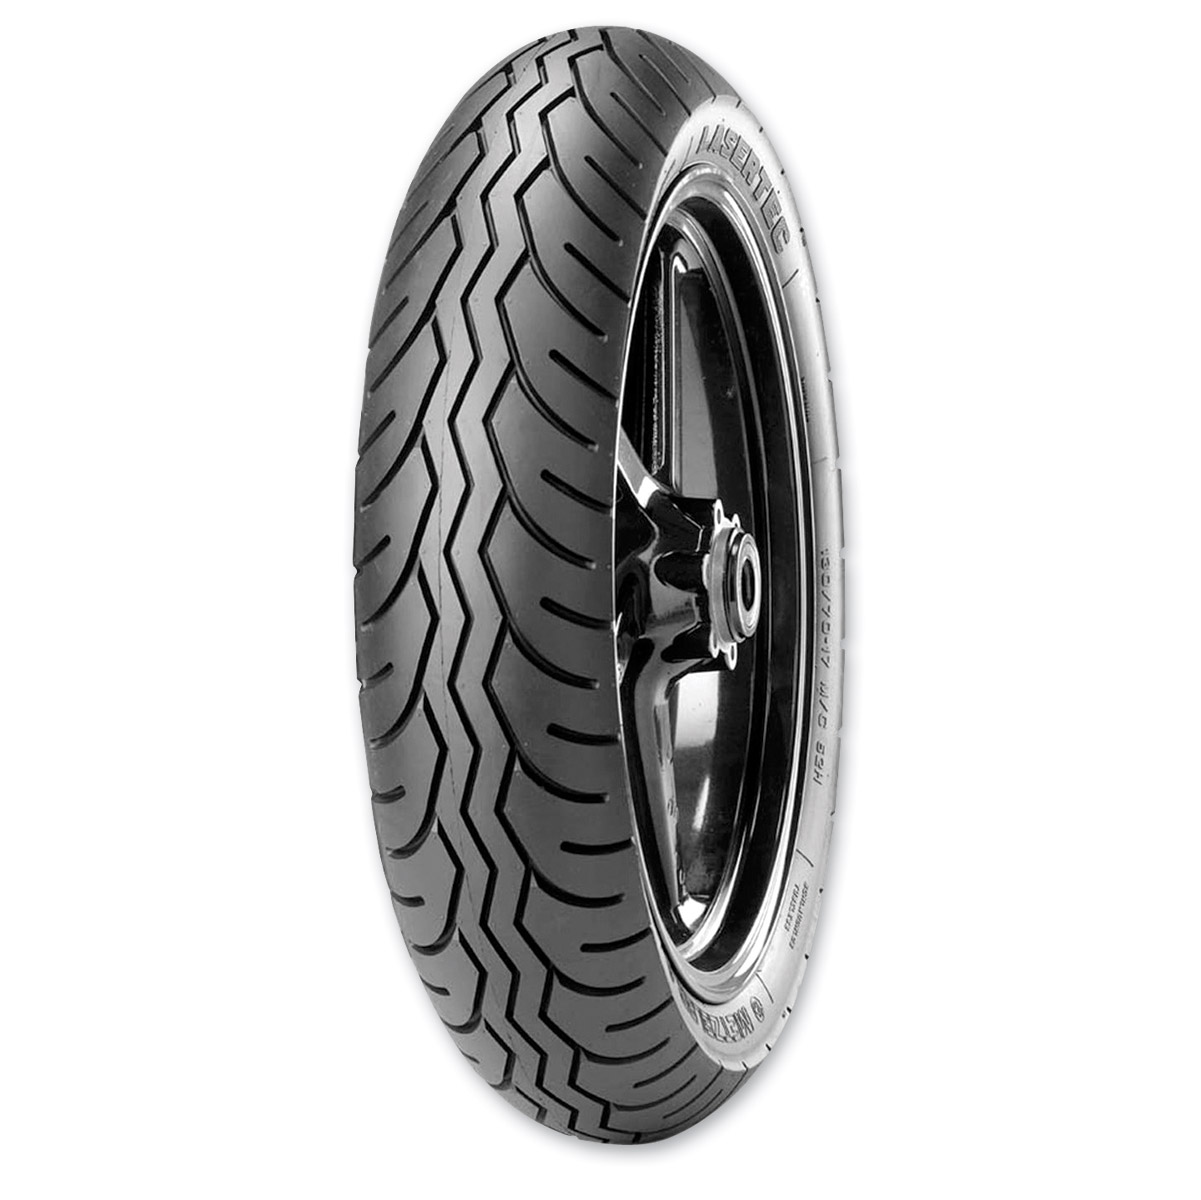 Metzeler Lasertec 130/90-17 Rear Tire